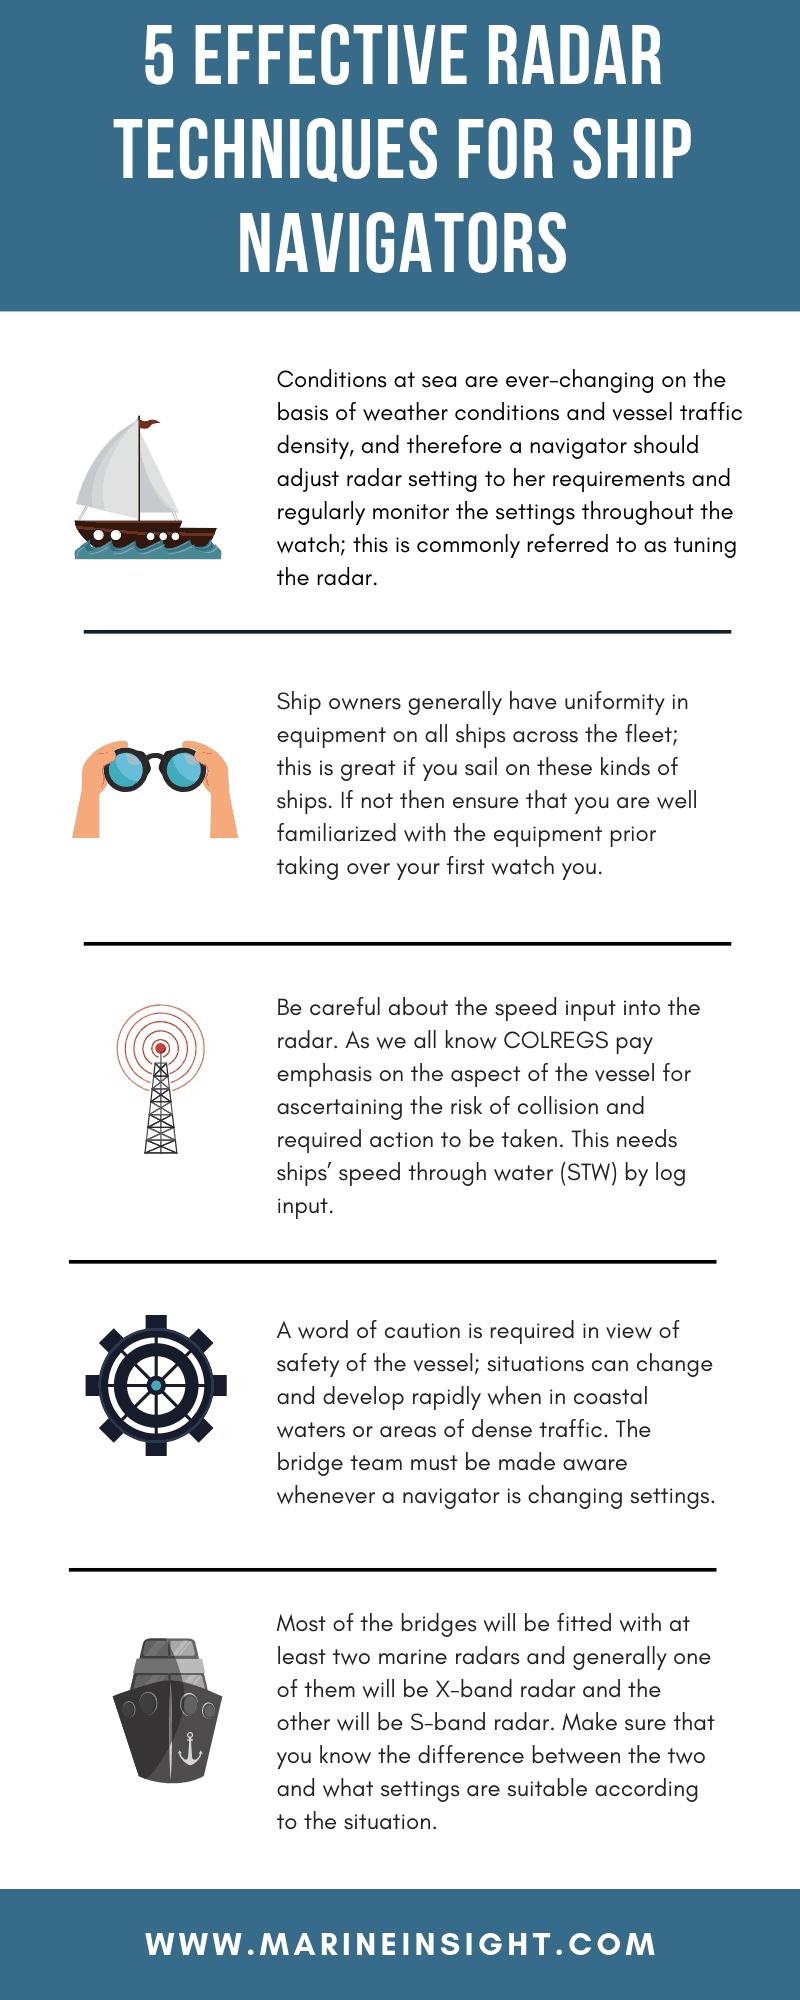 Radar Techniques